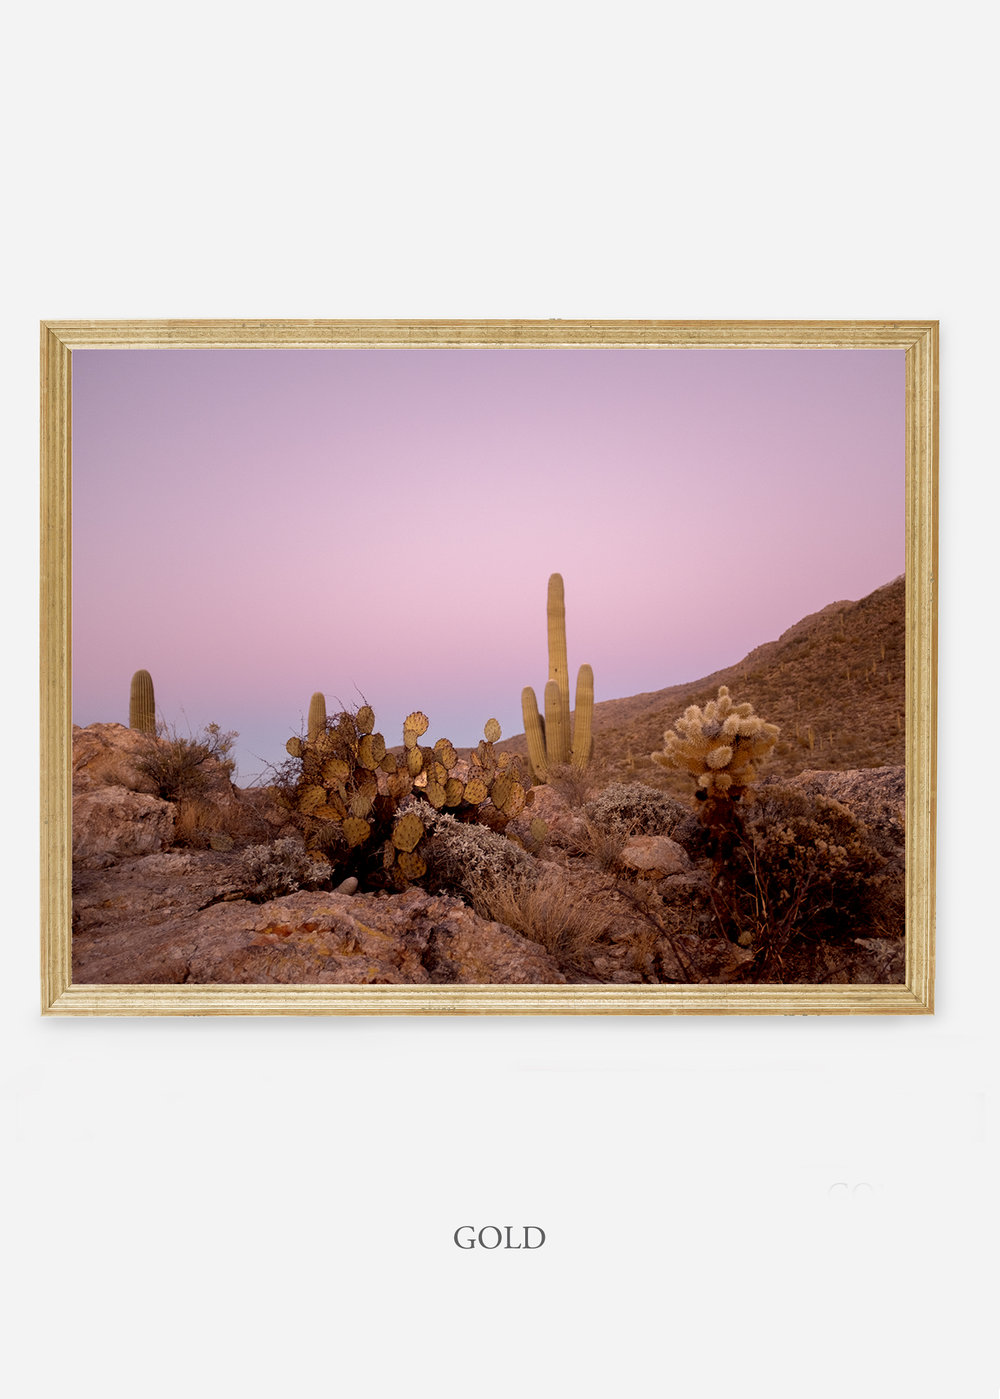 nomat-goldframe-saguaroNo.9-wildercalifornia-art-wallart-cactusprint-homedecor-prints-arizona-botanical-artwork-interiordesign.jpg